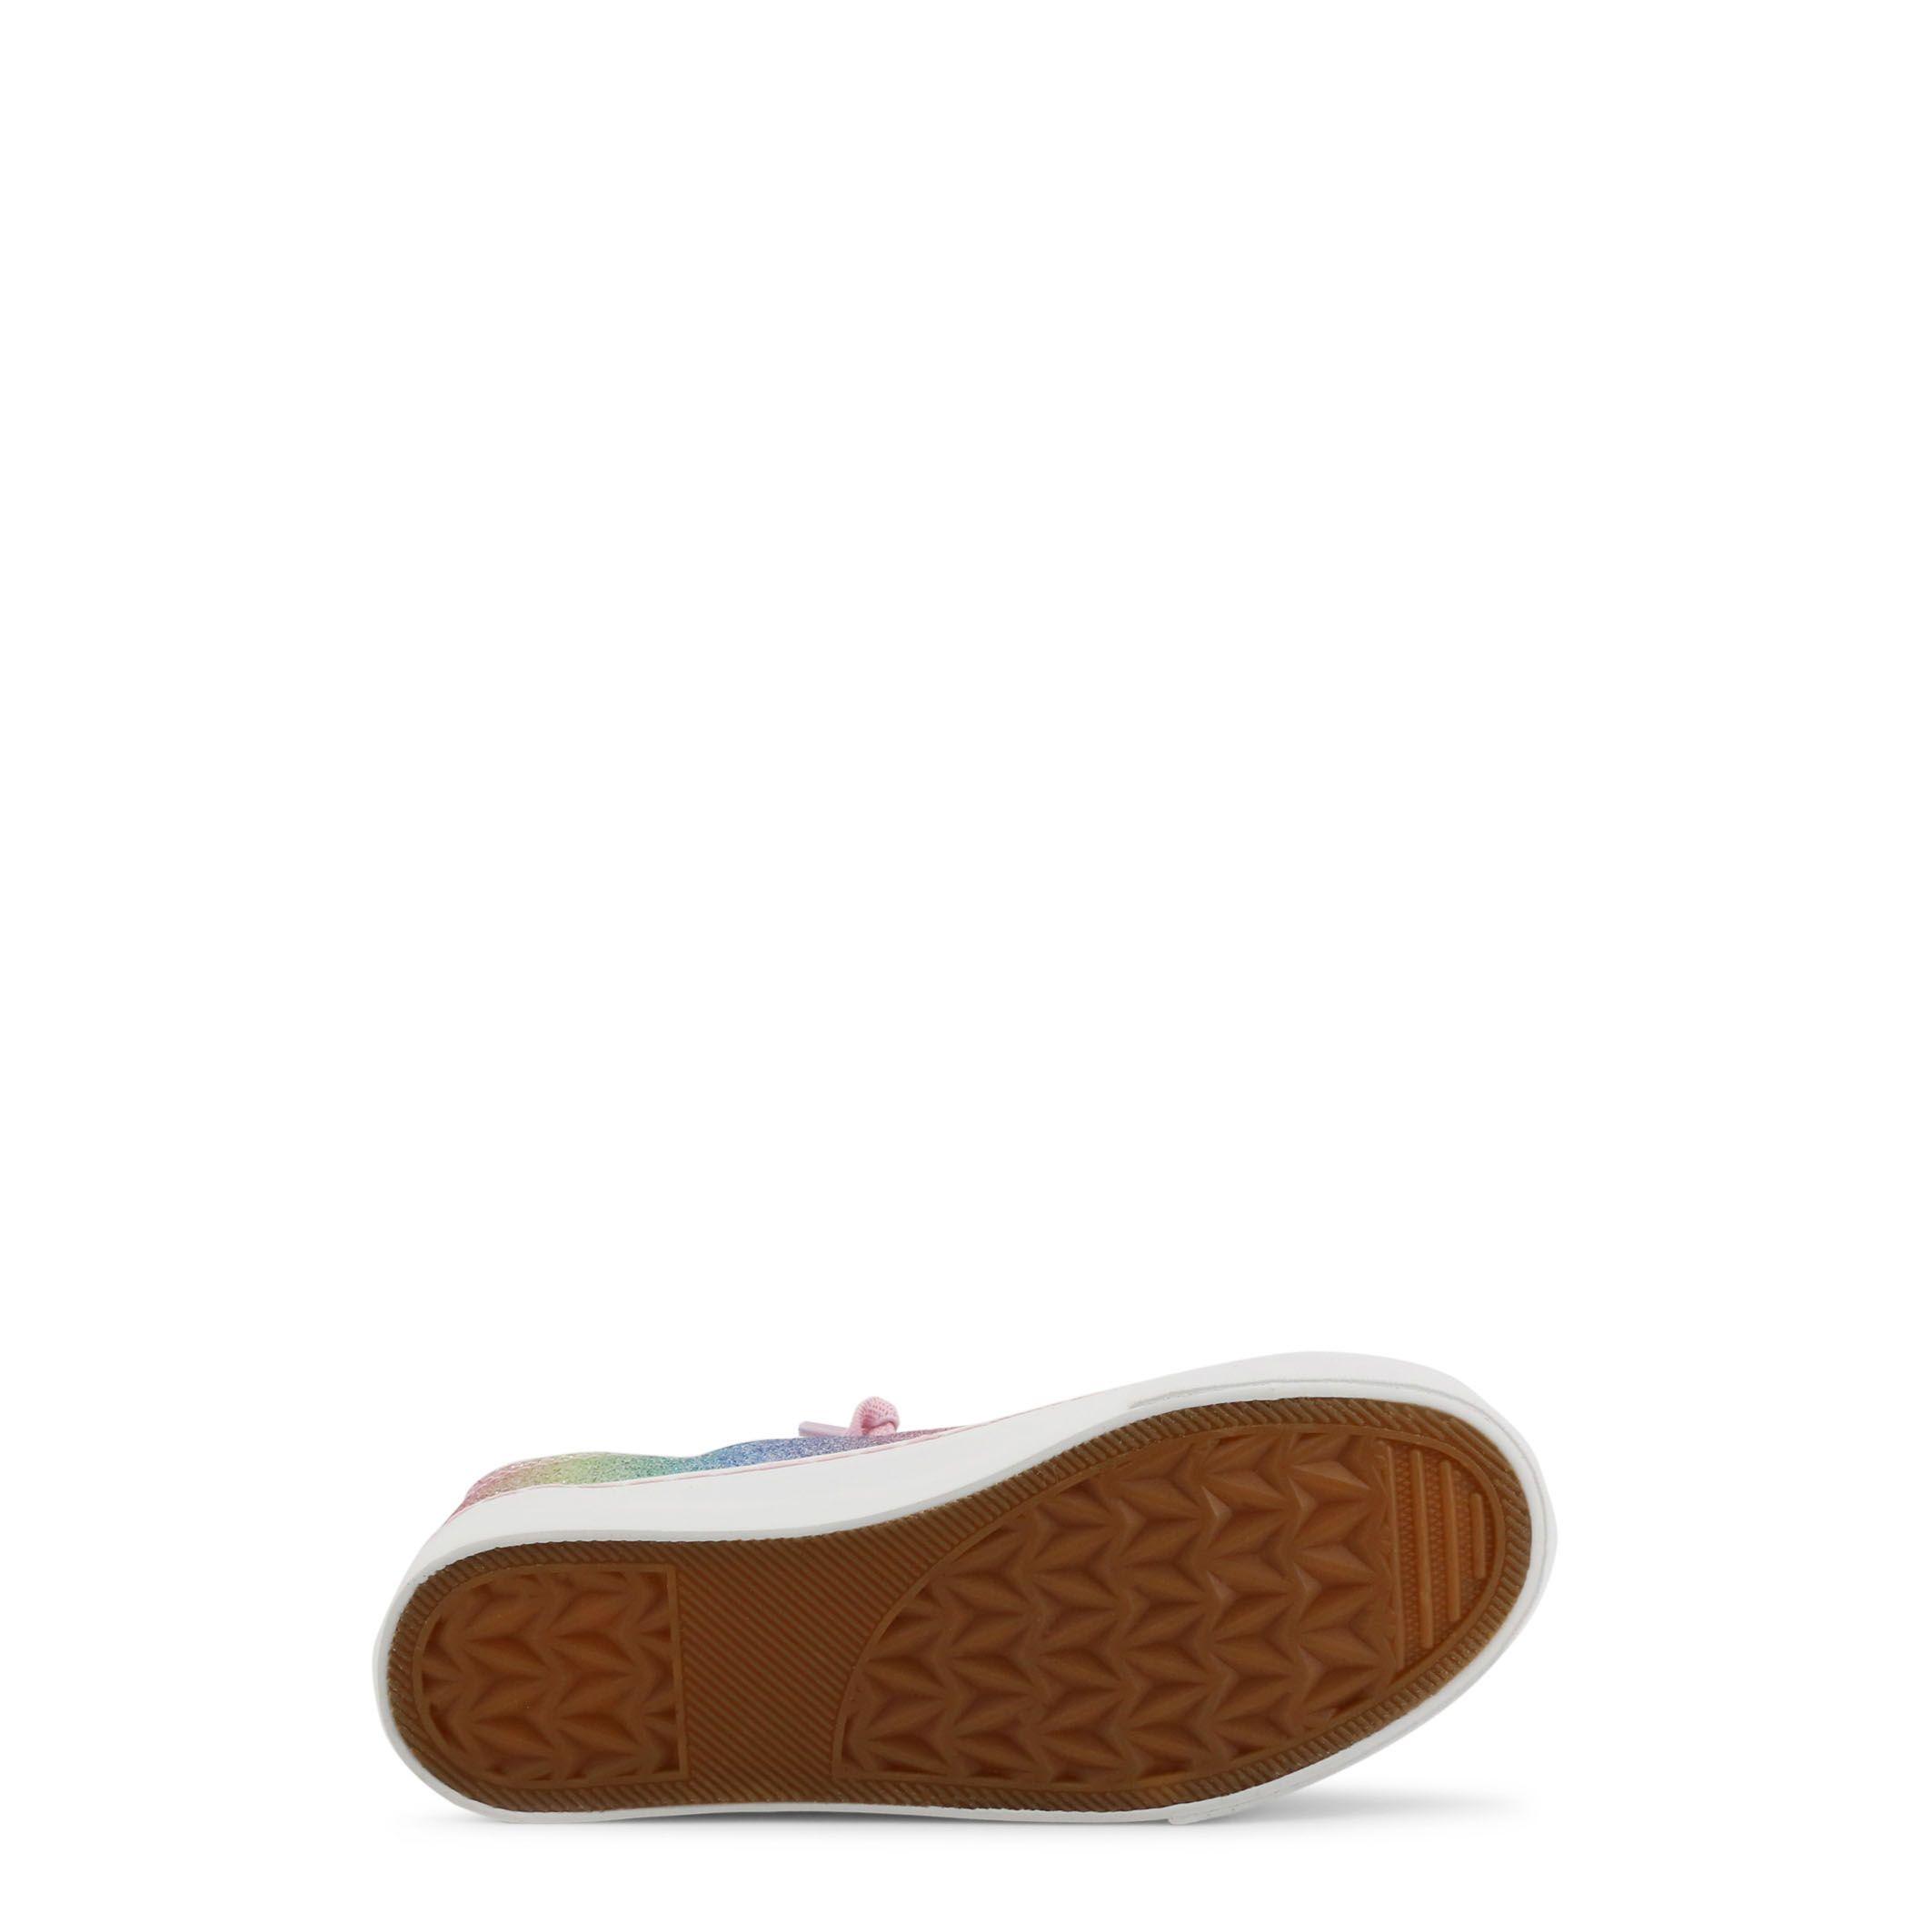 Shone – 292-003 – Roze Designeritems.nl